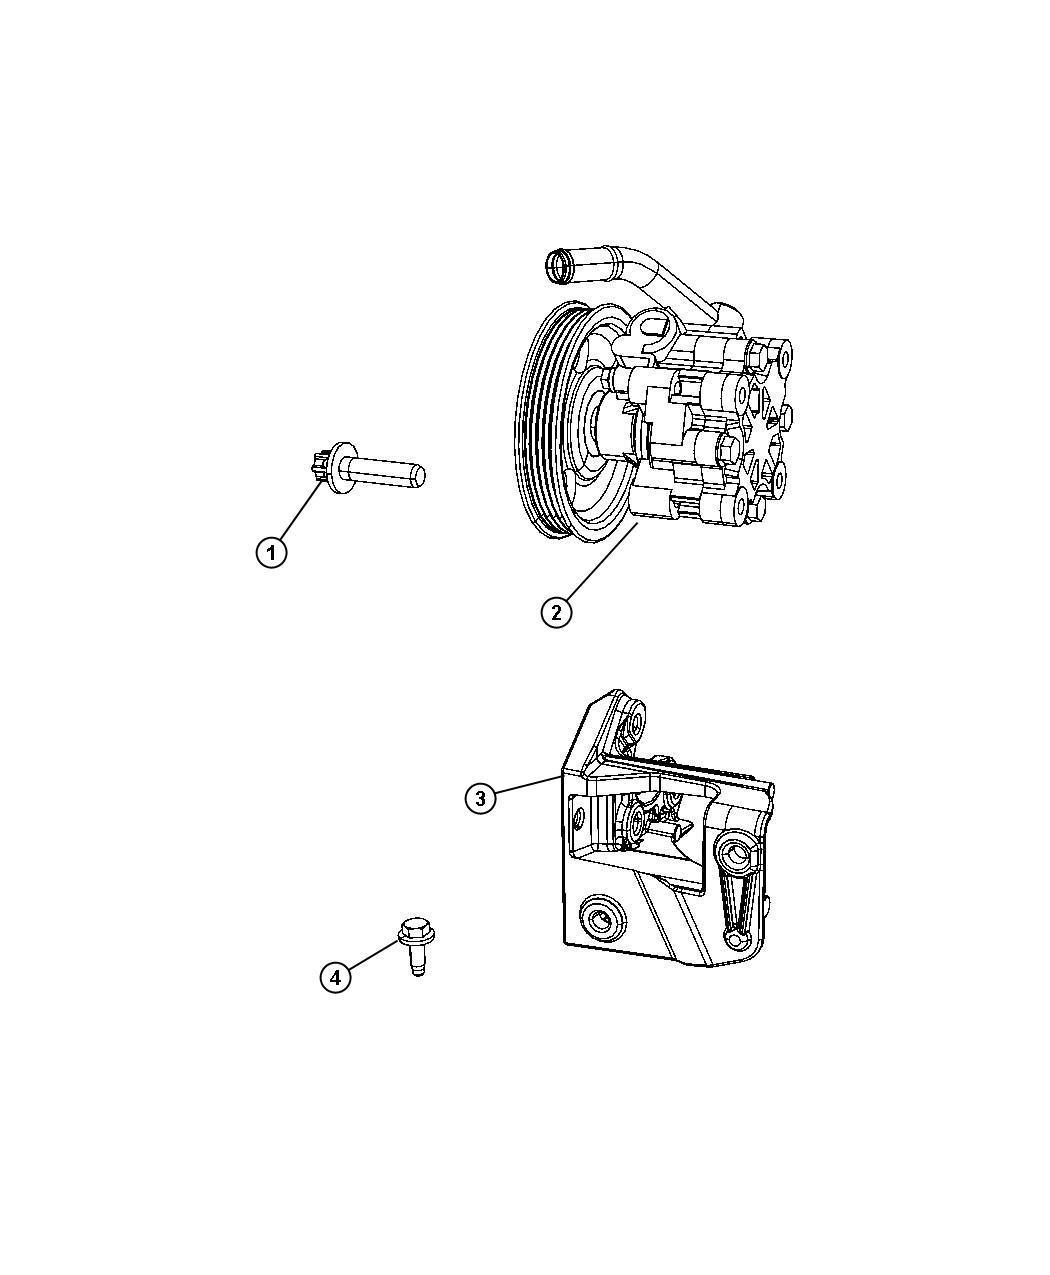 Chrysler Sebring Pump Power Steering